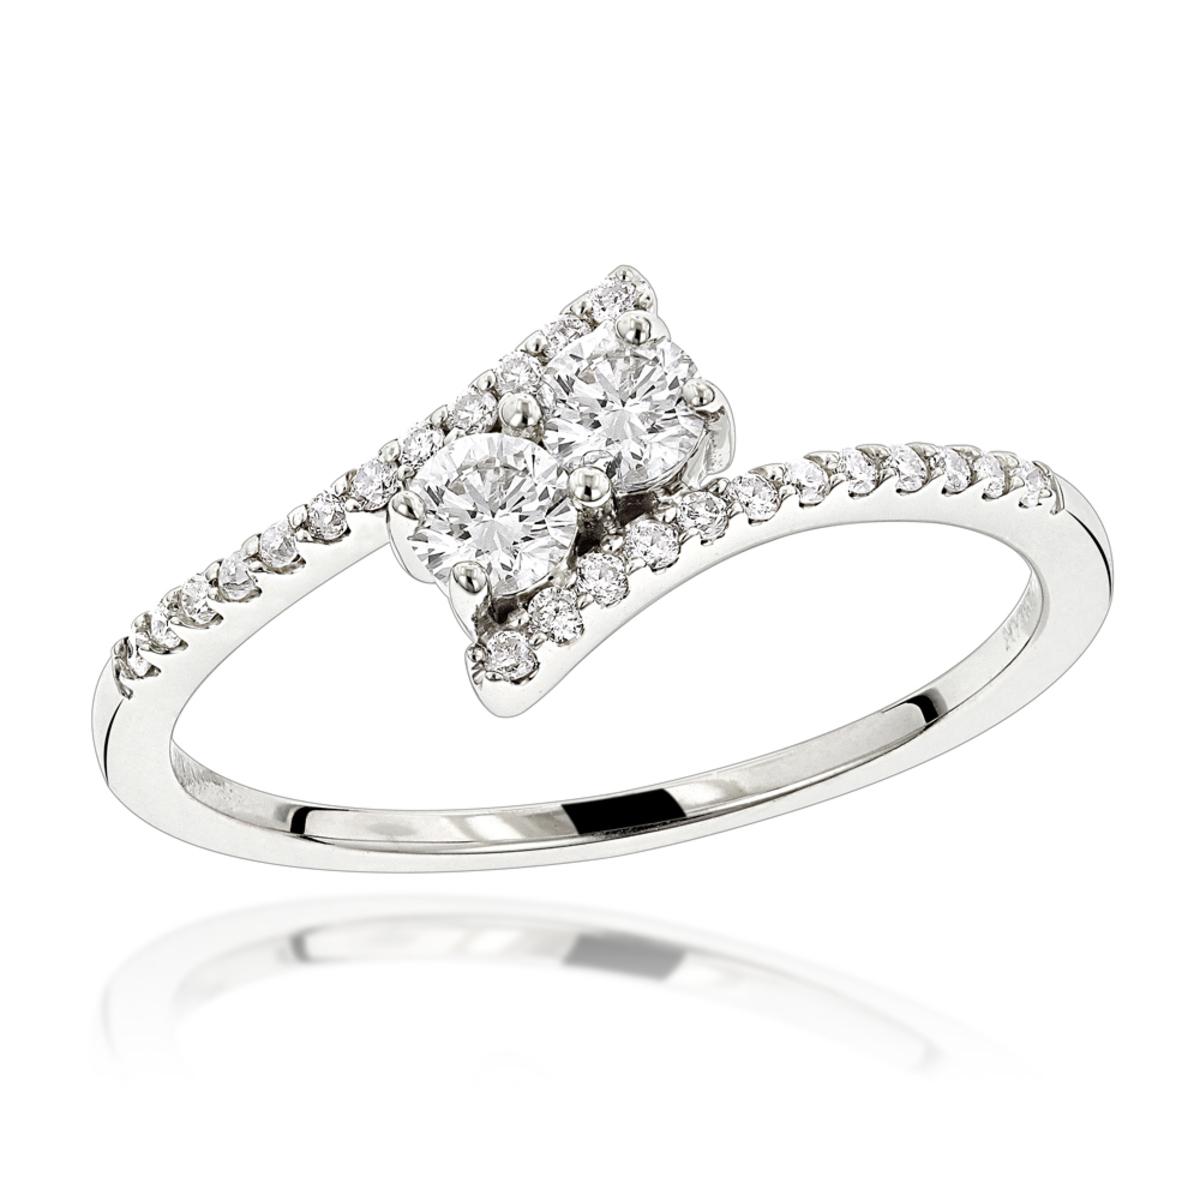 14K Gold 2 Stone Diamond Ladies Ring 0.4ct Love and Friendship Design